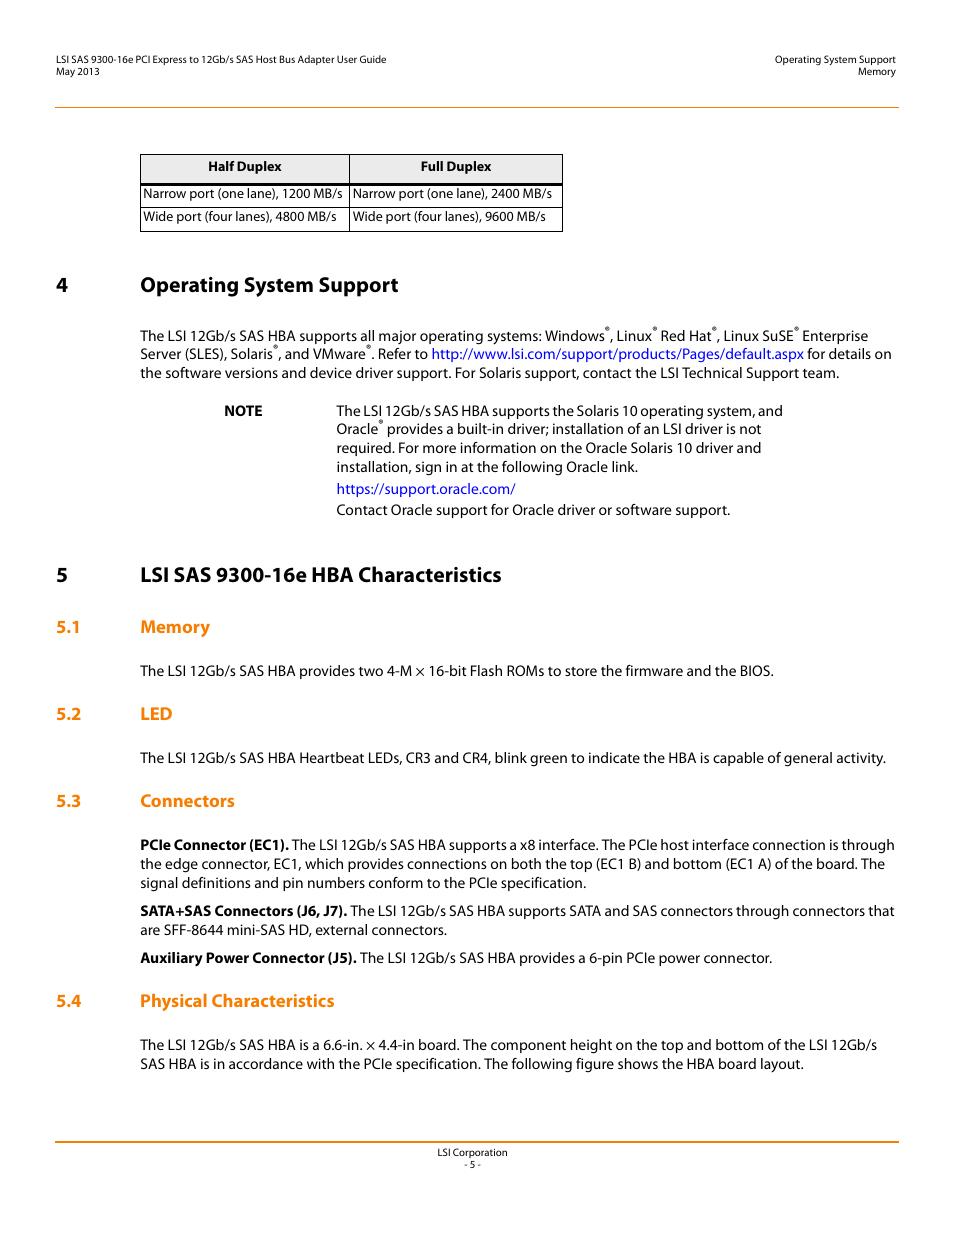 4 operating system support, 5 lsi sas 9300-16e hba characteristics